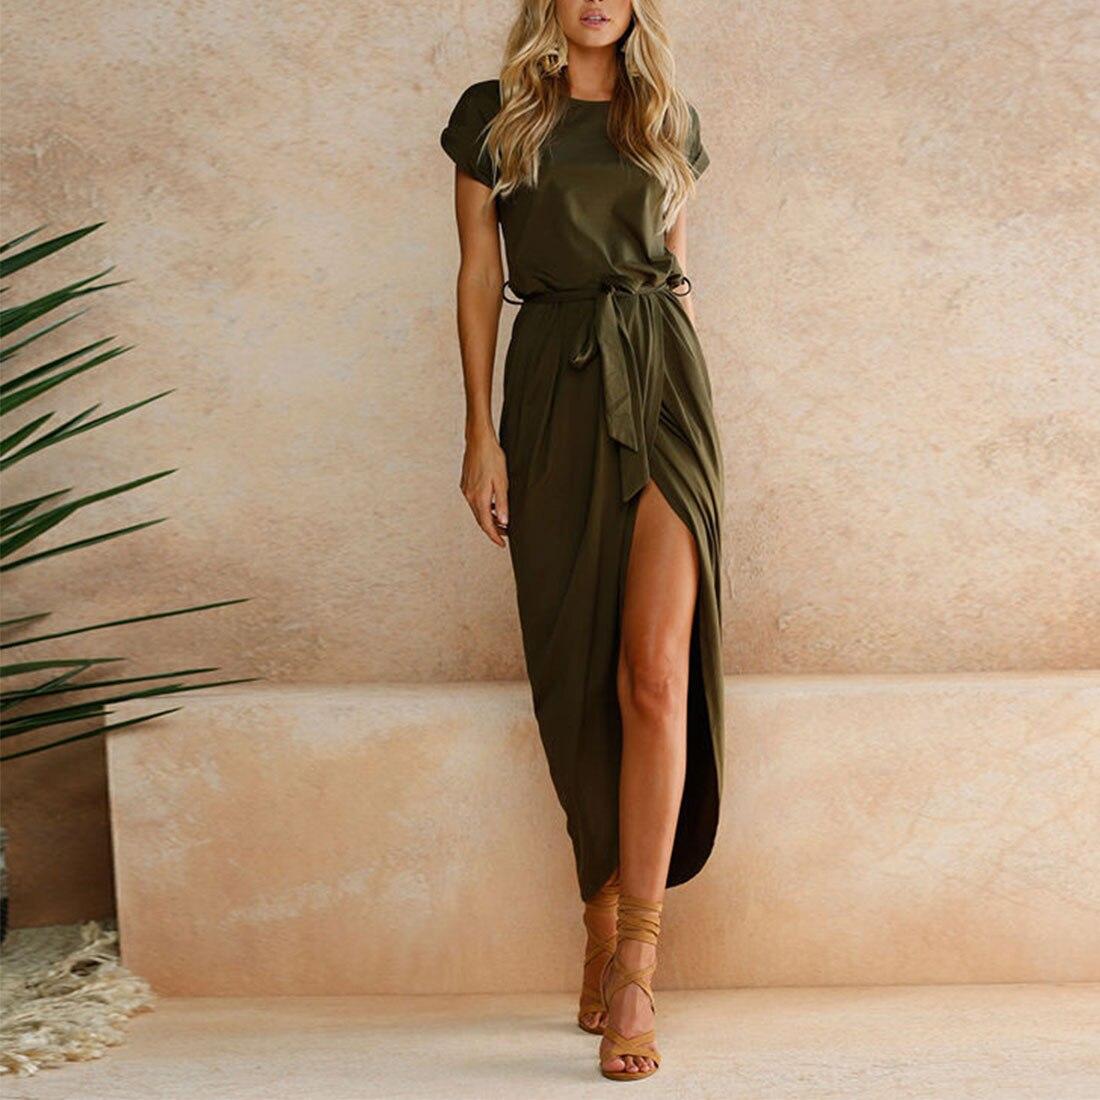 Comfortable 2017 Women Summer Sexy Fashion Boho Long Maxi Dress Party Beach Dresses Sundress